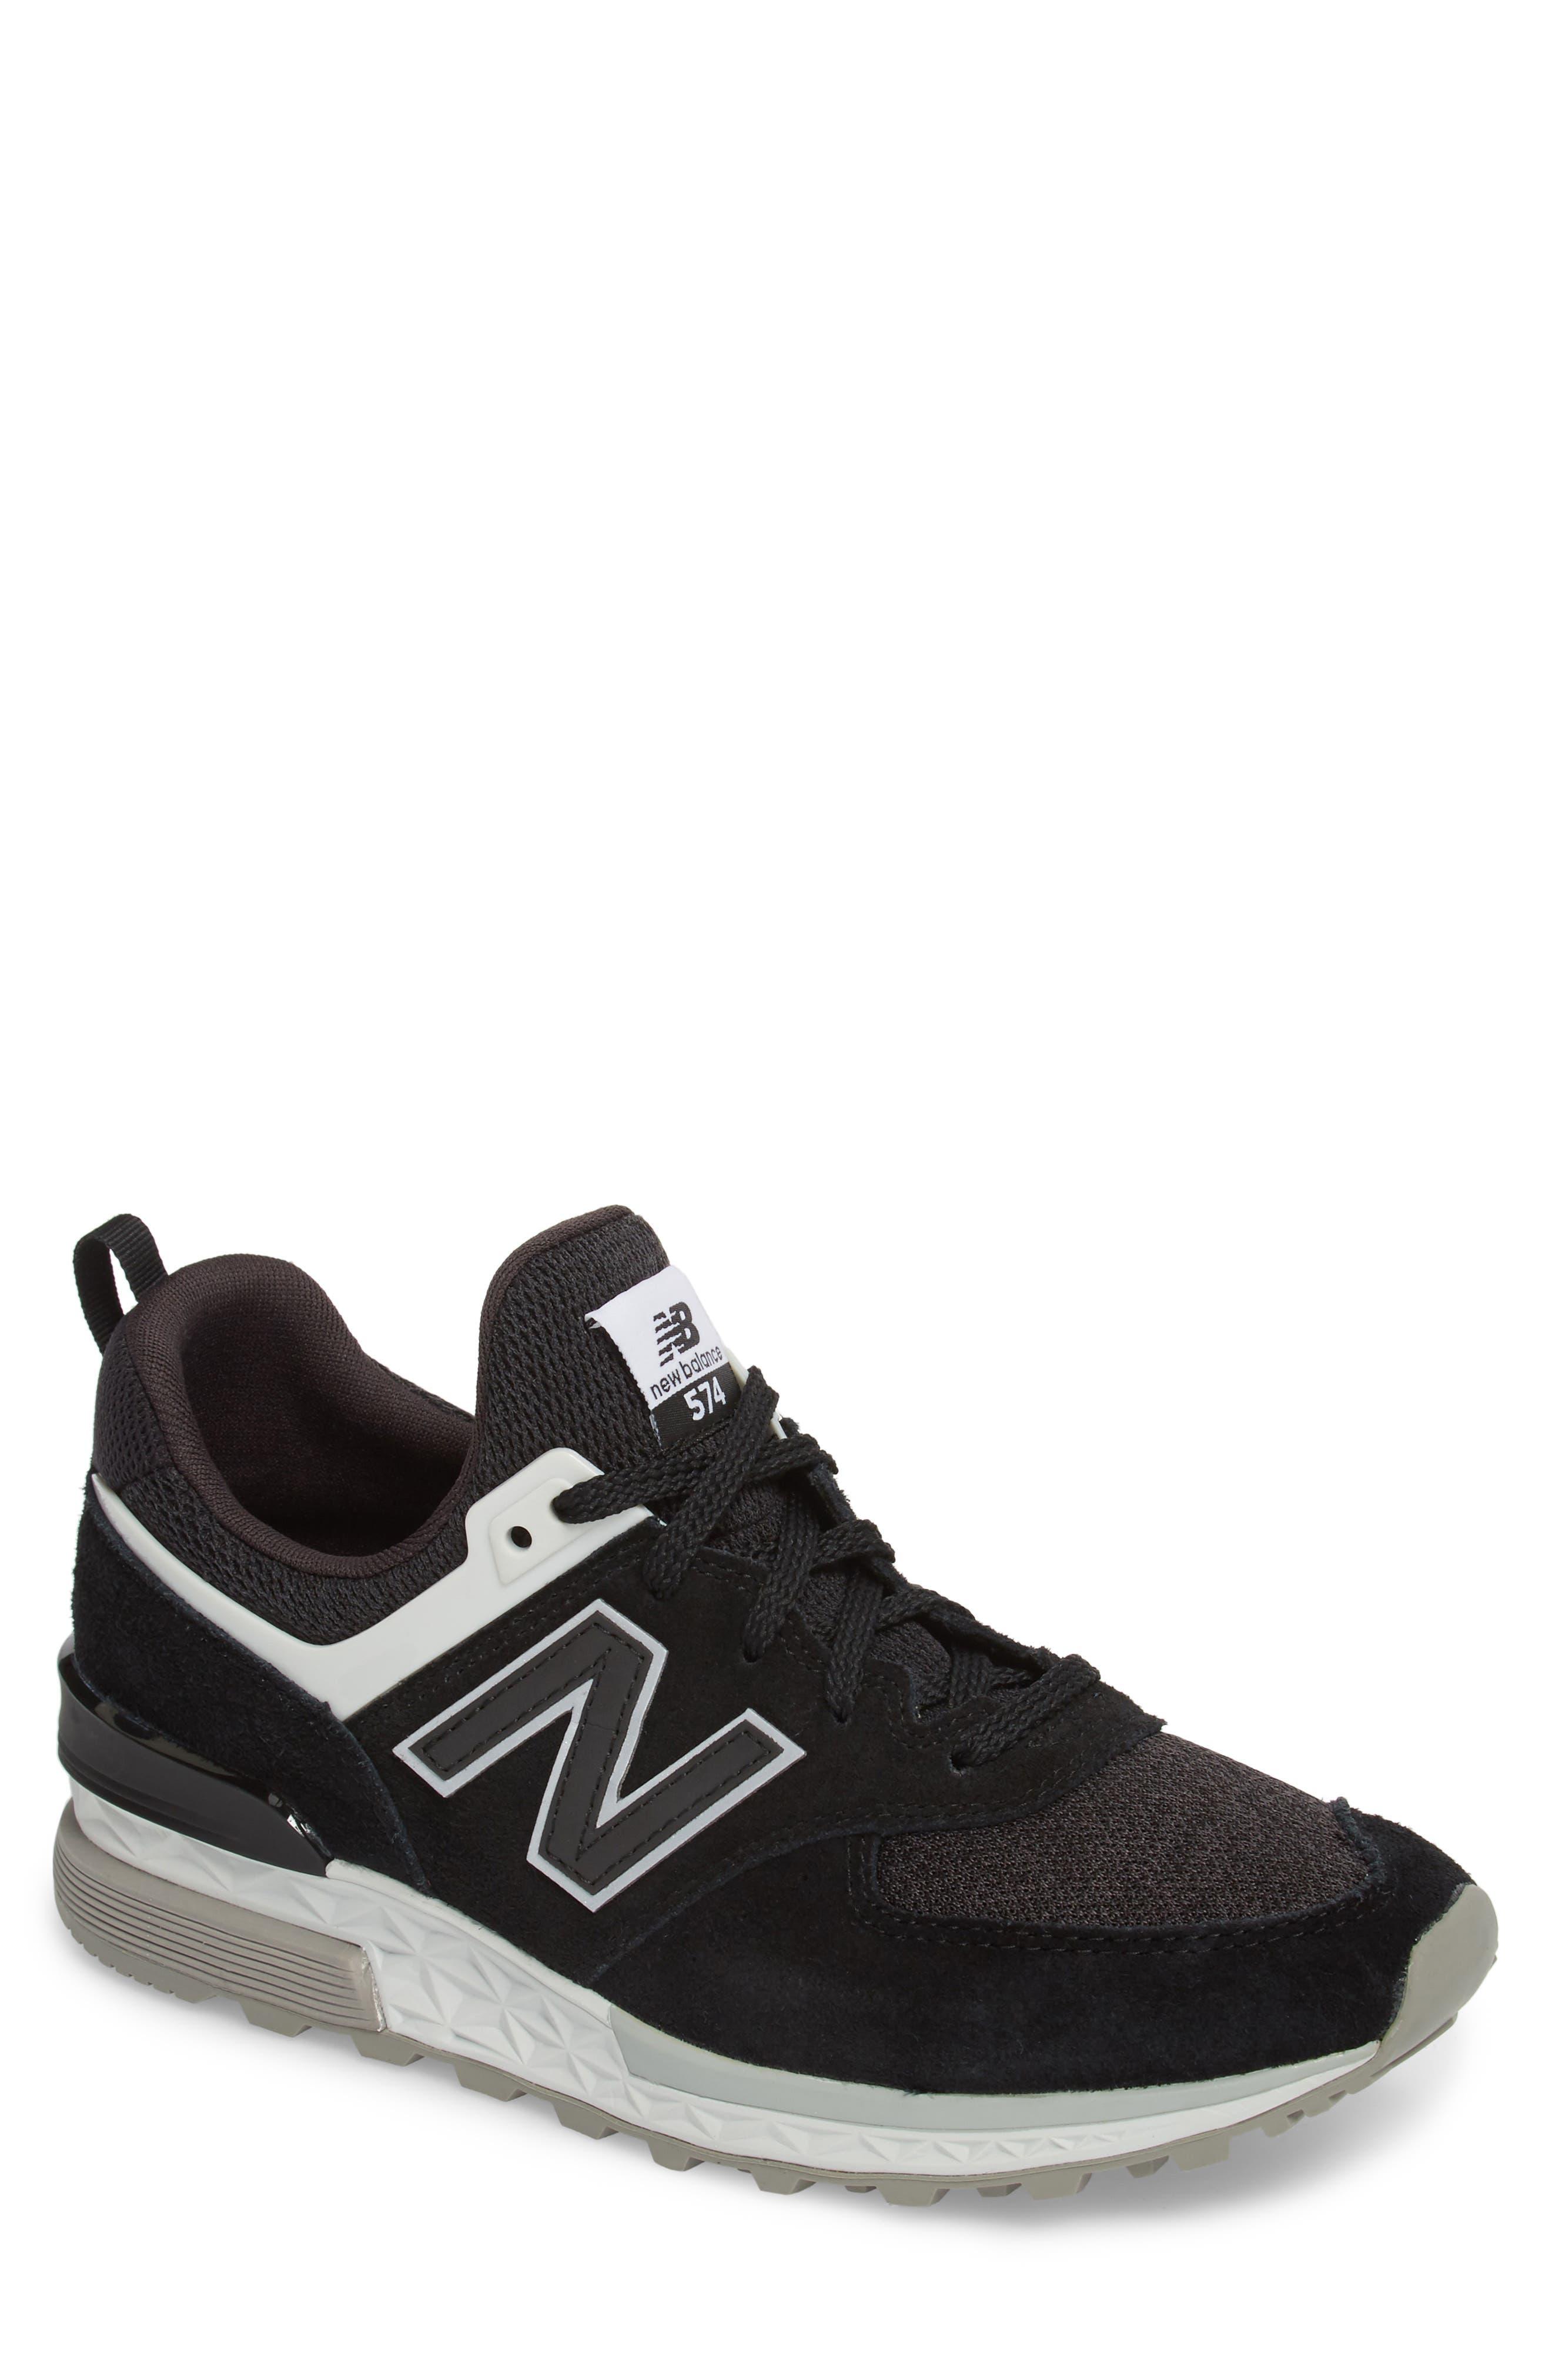 Main Image - New Balance 574 Sport Sneaker (Men)